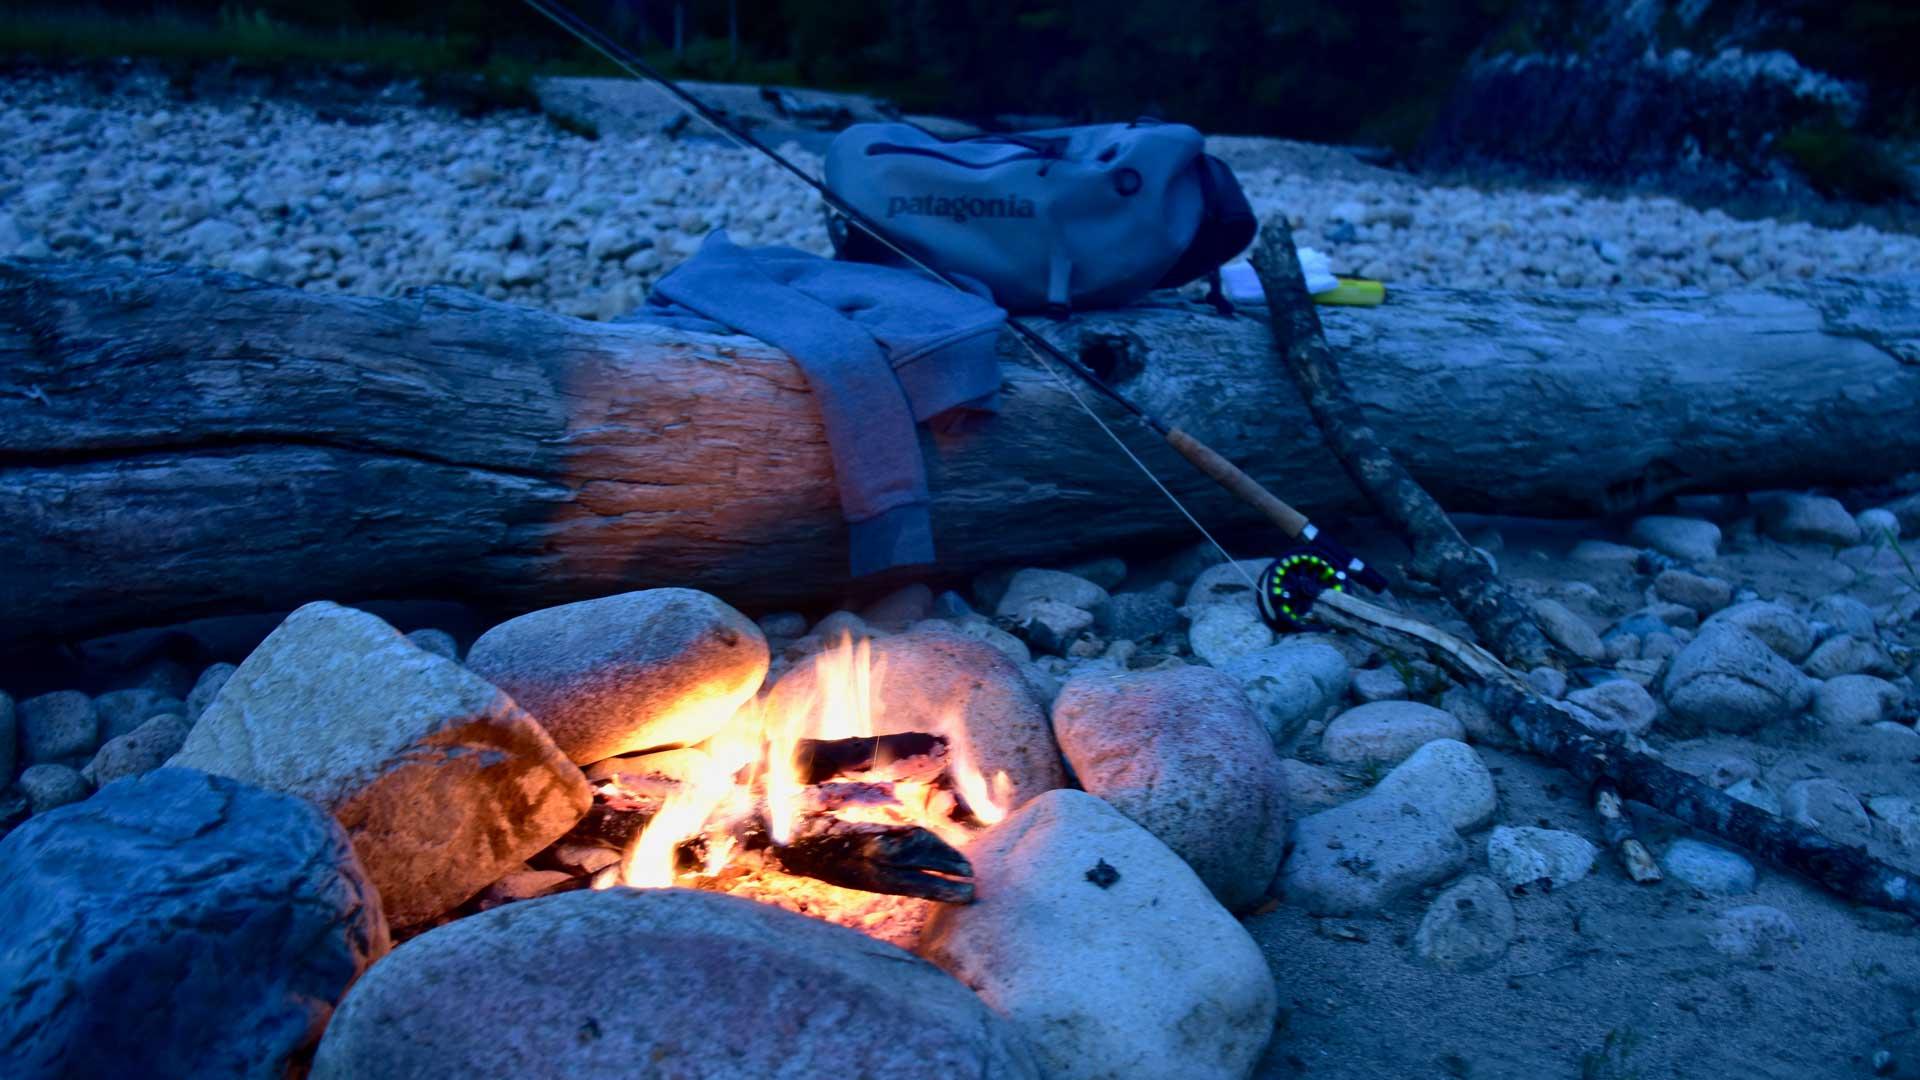 Erholung am Lagerfeuer im Mañihuales Tal